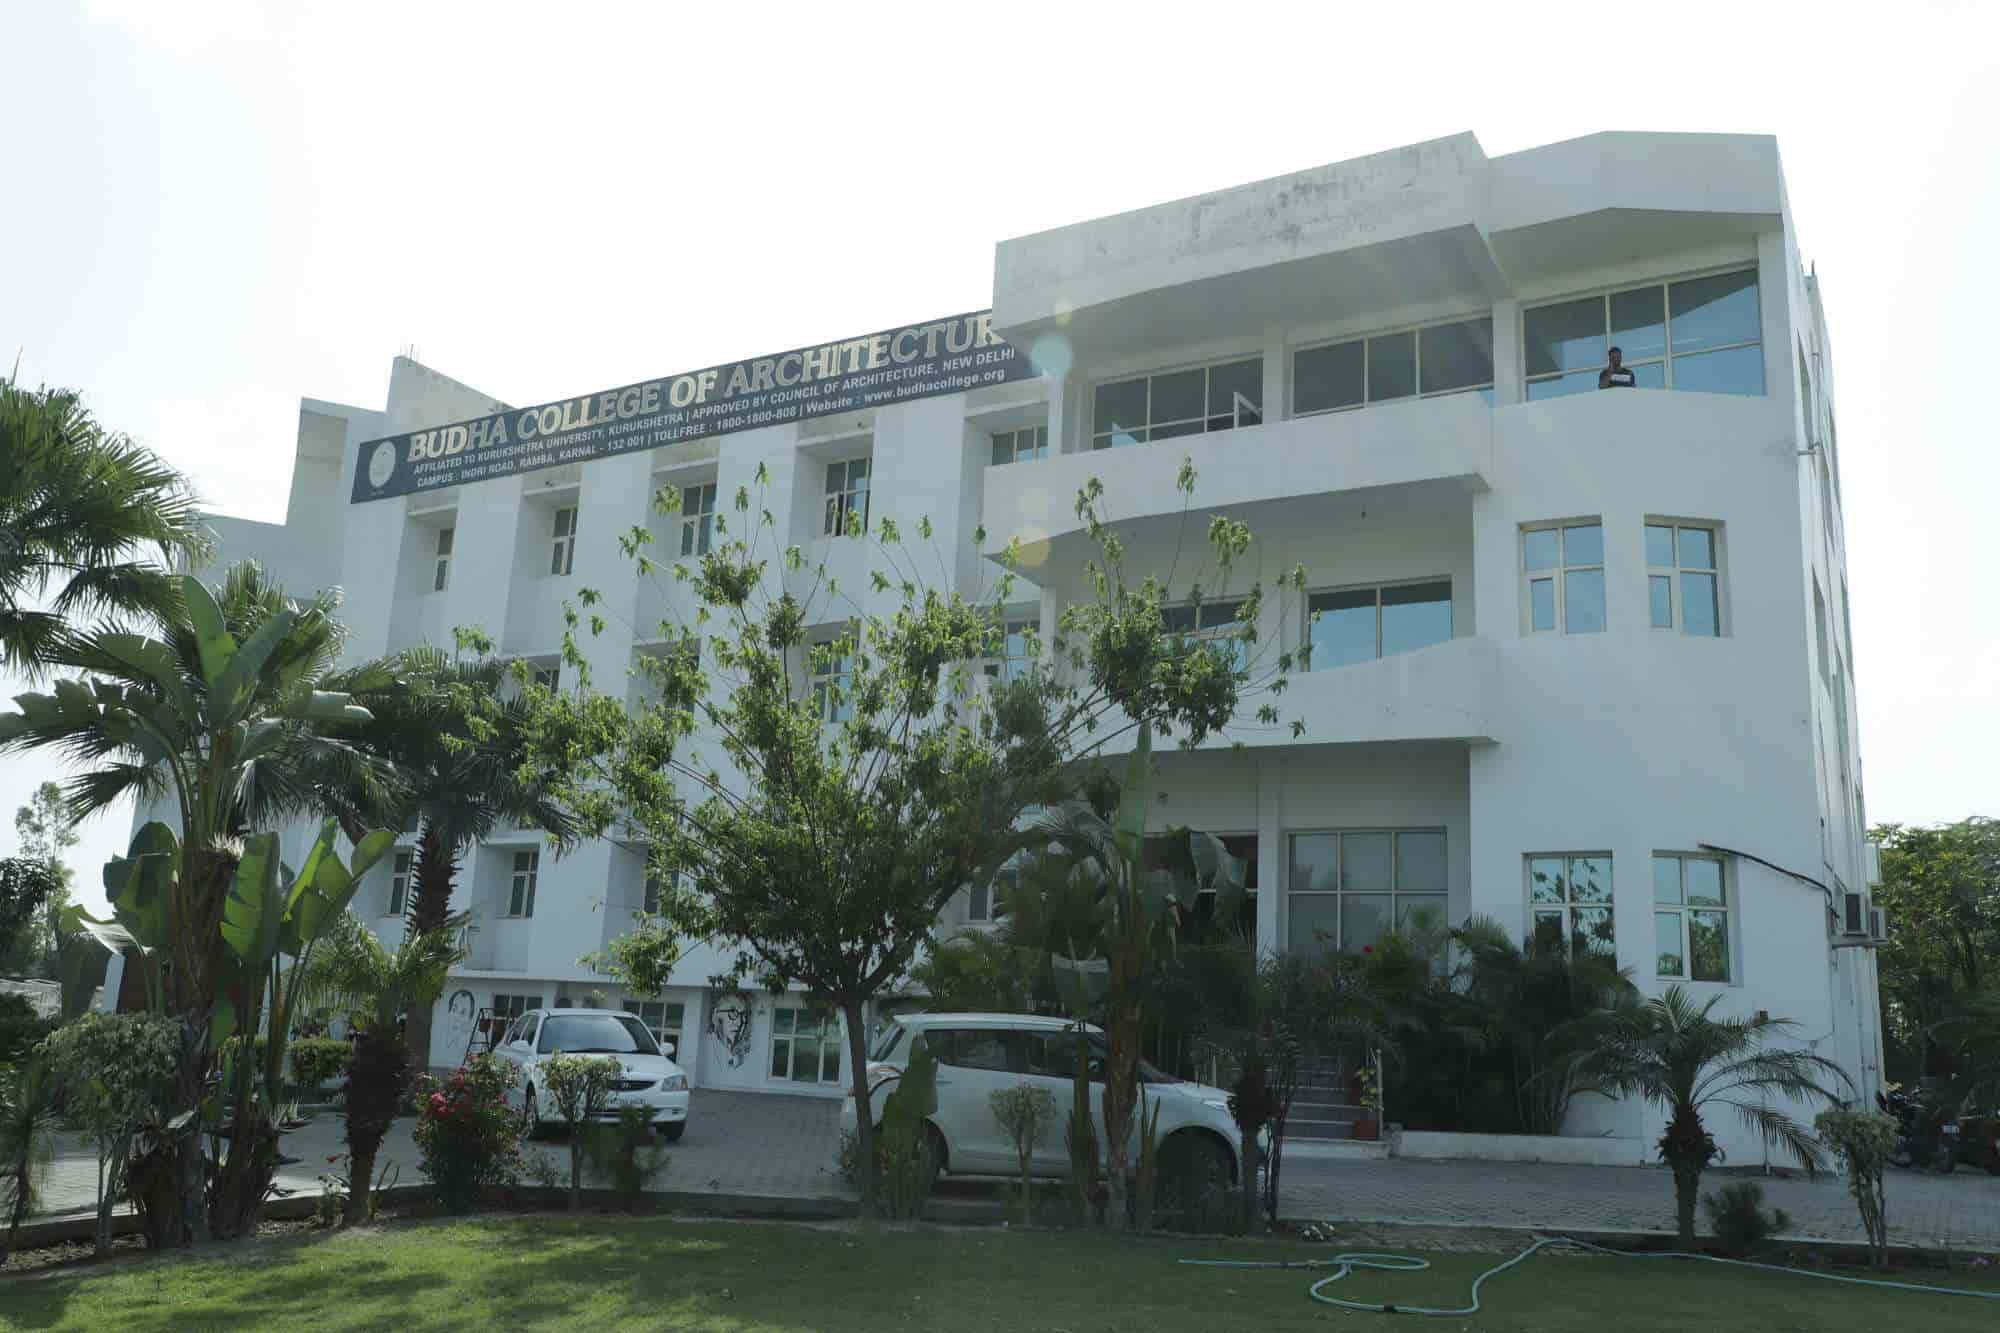 Top 10 Fashion Designing Institutes In Meerut Road Best Fashion Designing Colleges Meerut Road Karnal Justdial